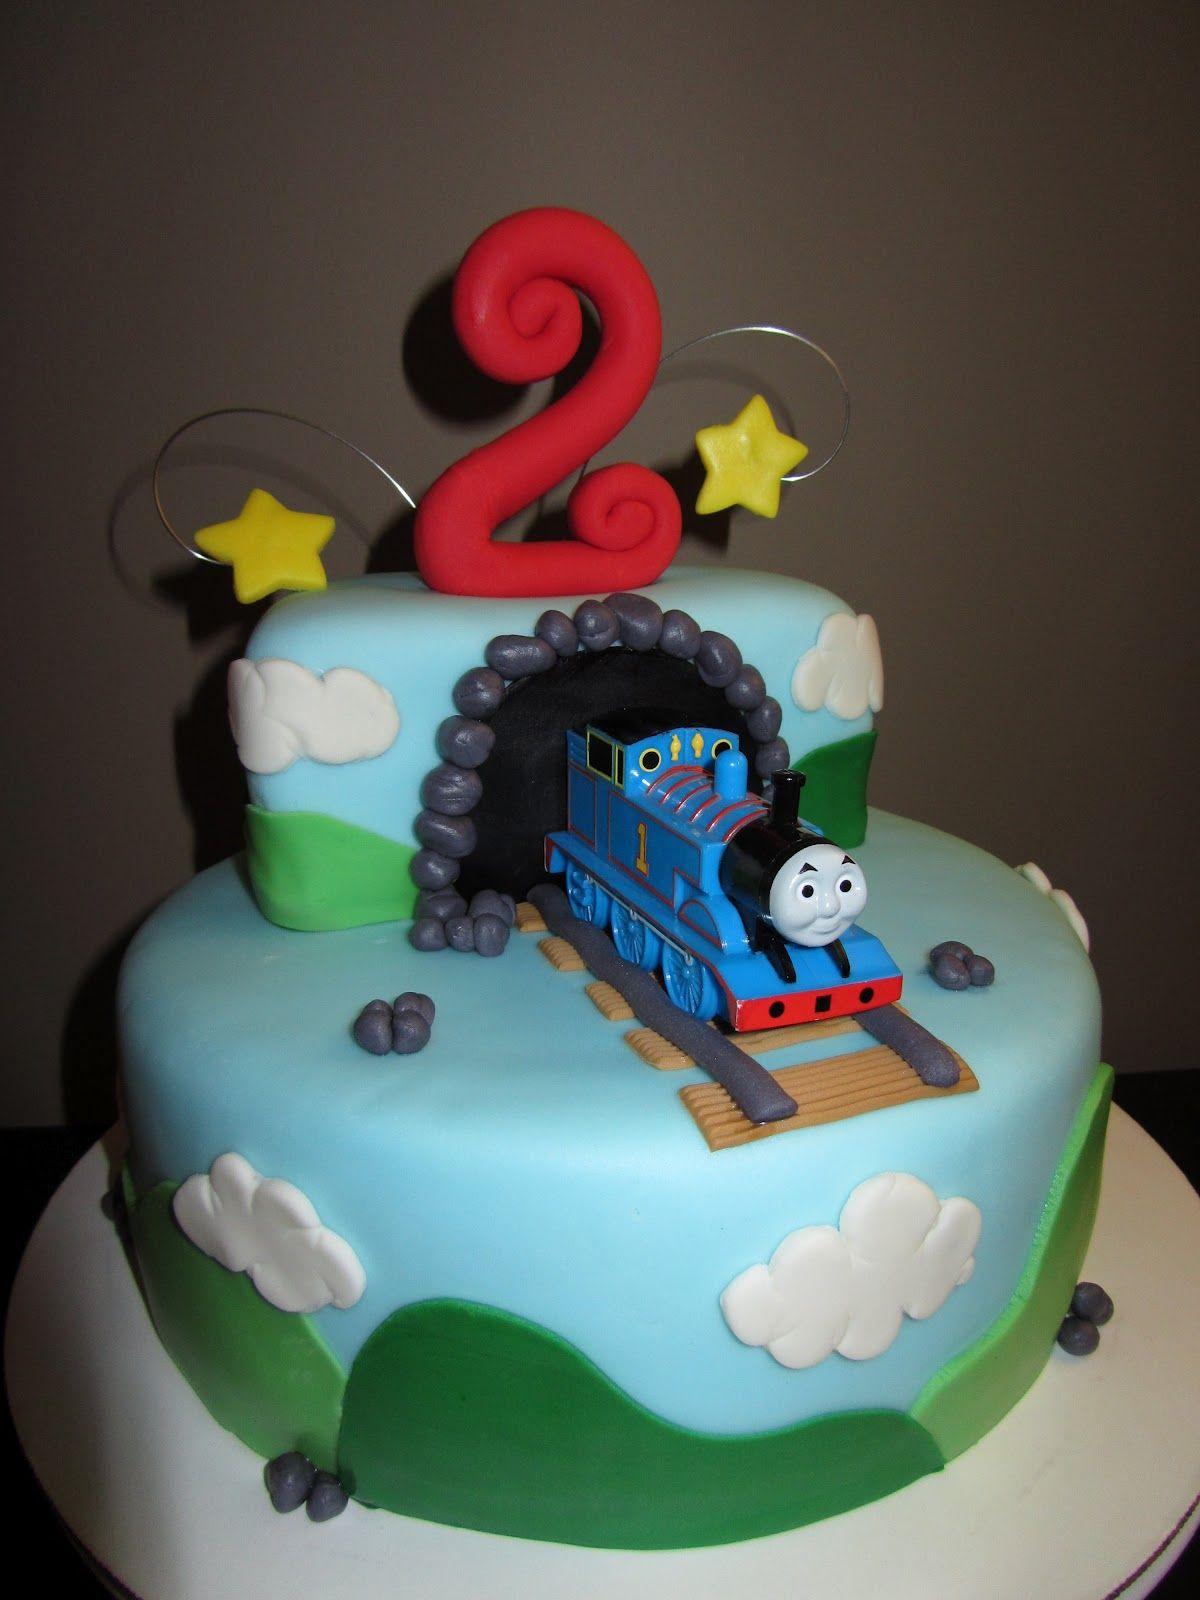 Interactive Thomas The Train Birthday Cakes Yahoo Search Results - Thomas birthday cake images